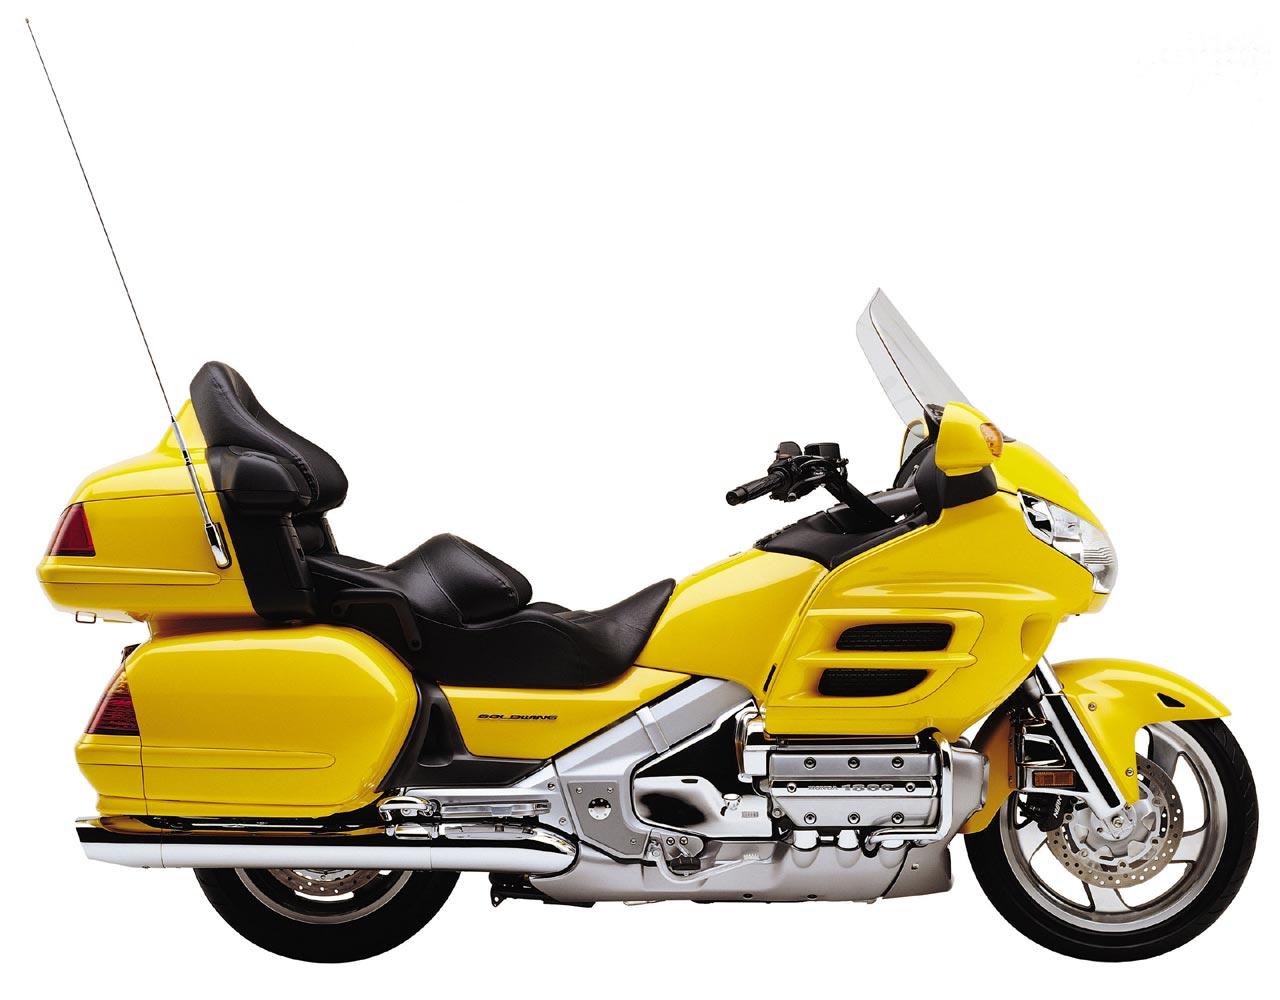 honda gl 1800 gold wing specs 2000 2001 autoevolution. Black Bedroom Furniture Sets. Home Design Ideas